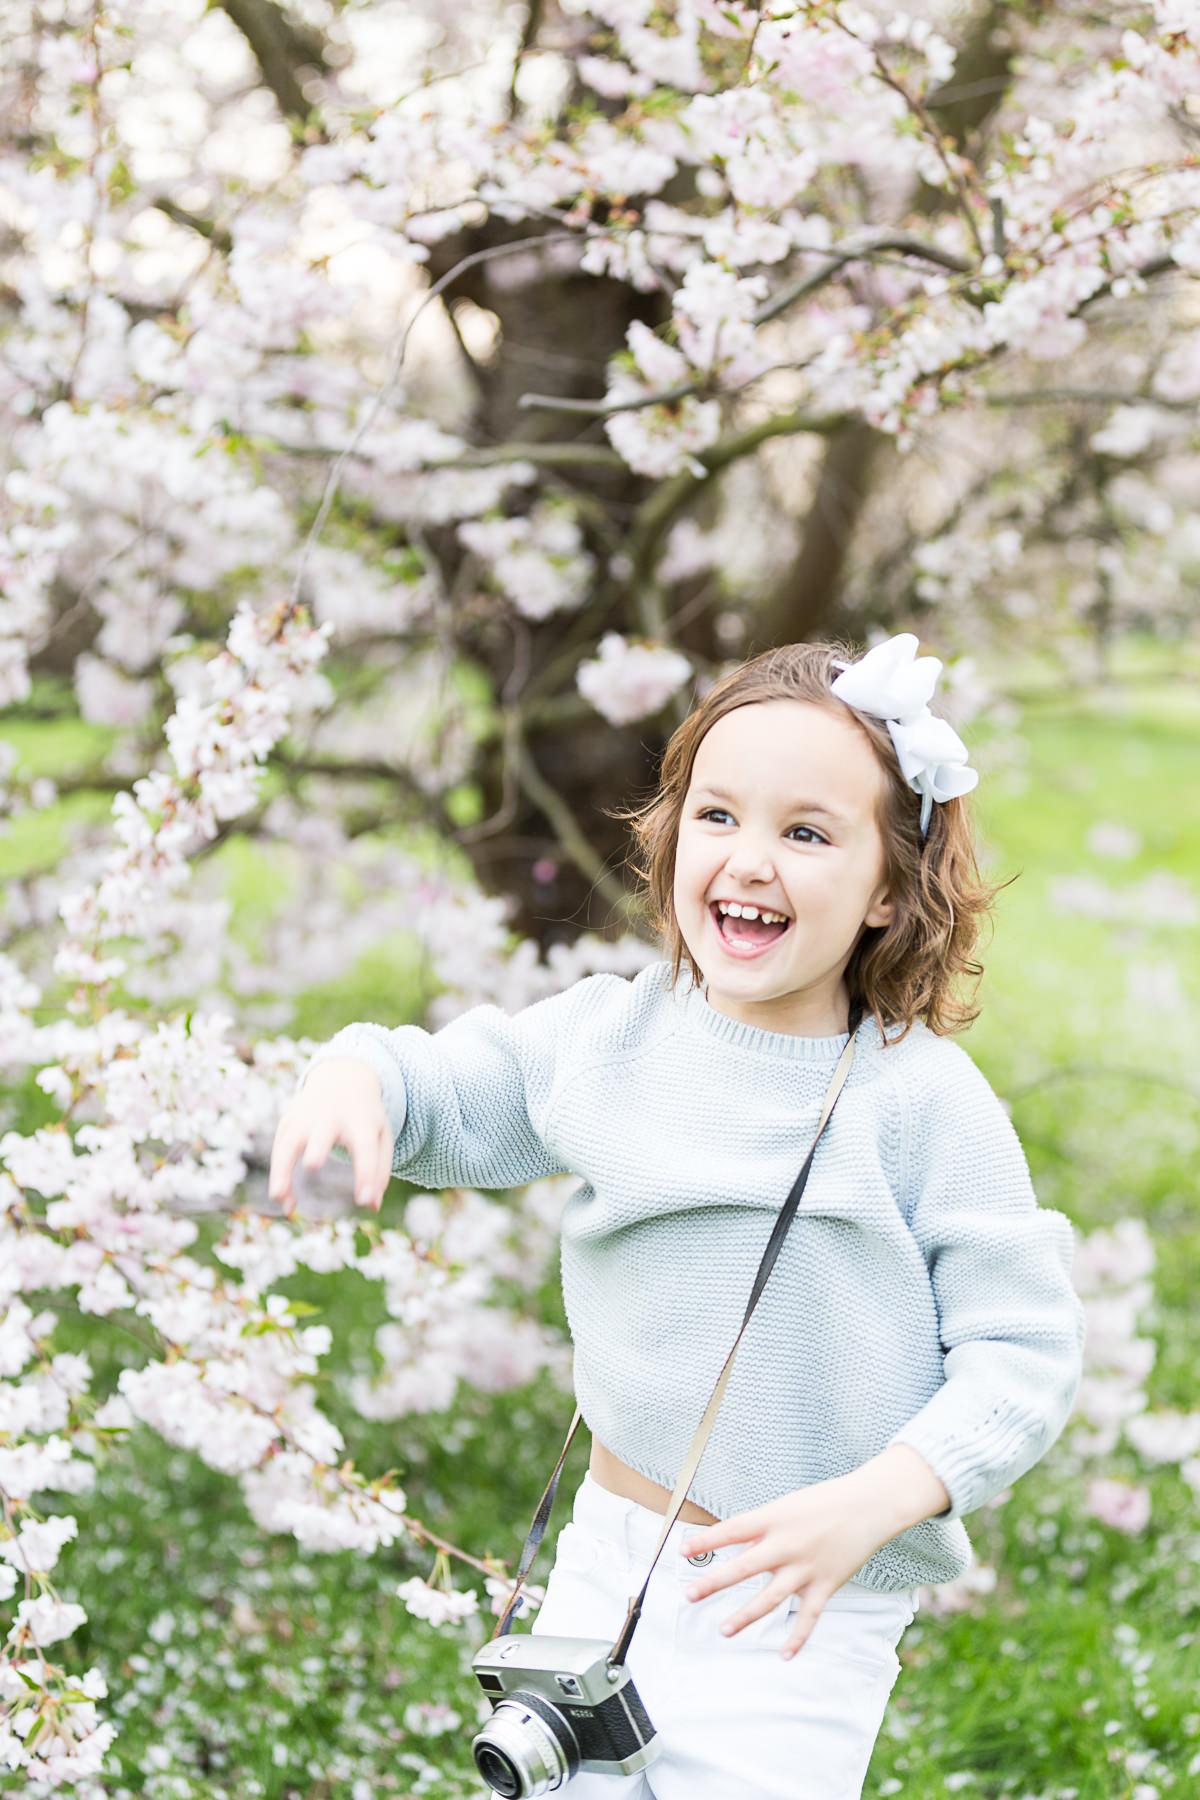 blossom shoots by Nina Callow of 3B&ME photography London/Kent